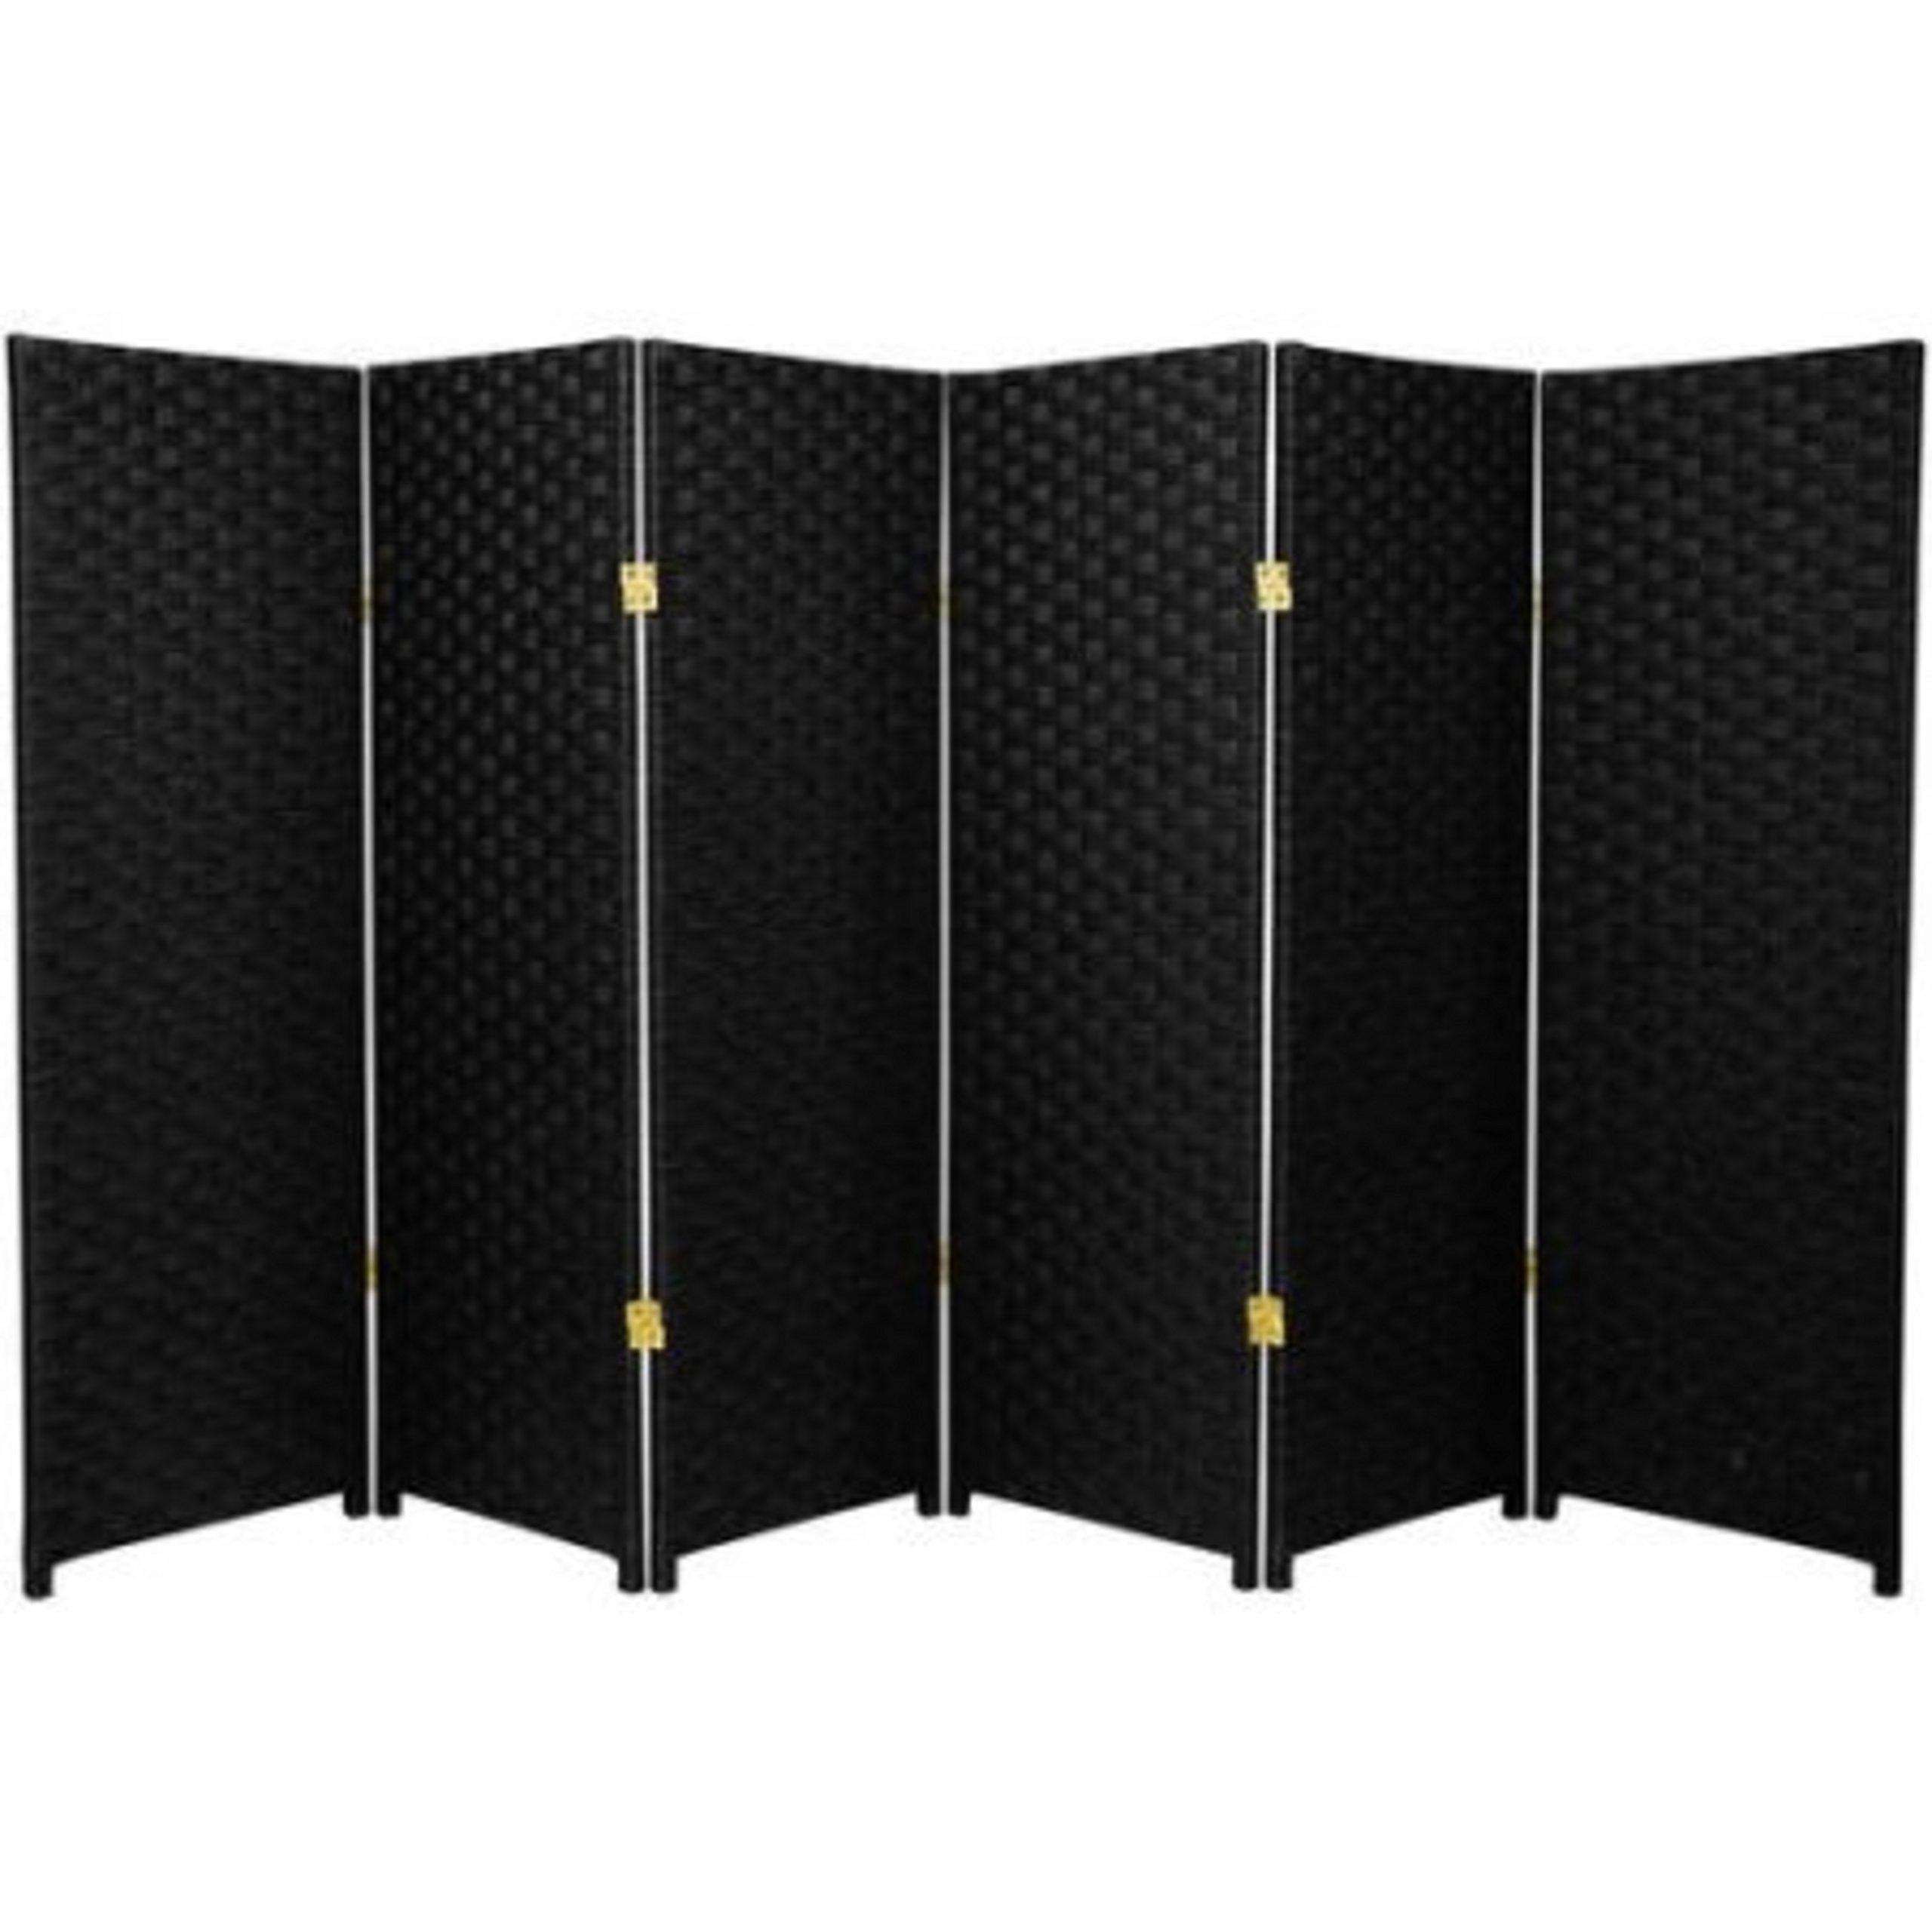 Natural Plant Fiber Woven Room Decor Black 6 Panels Divider